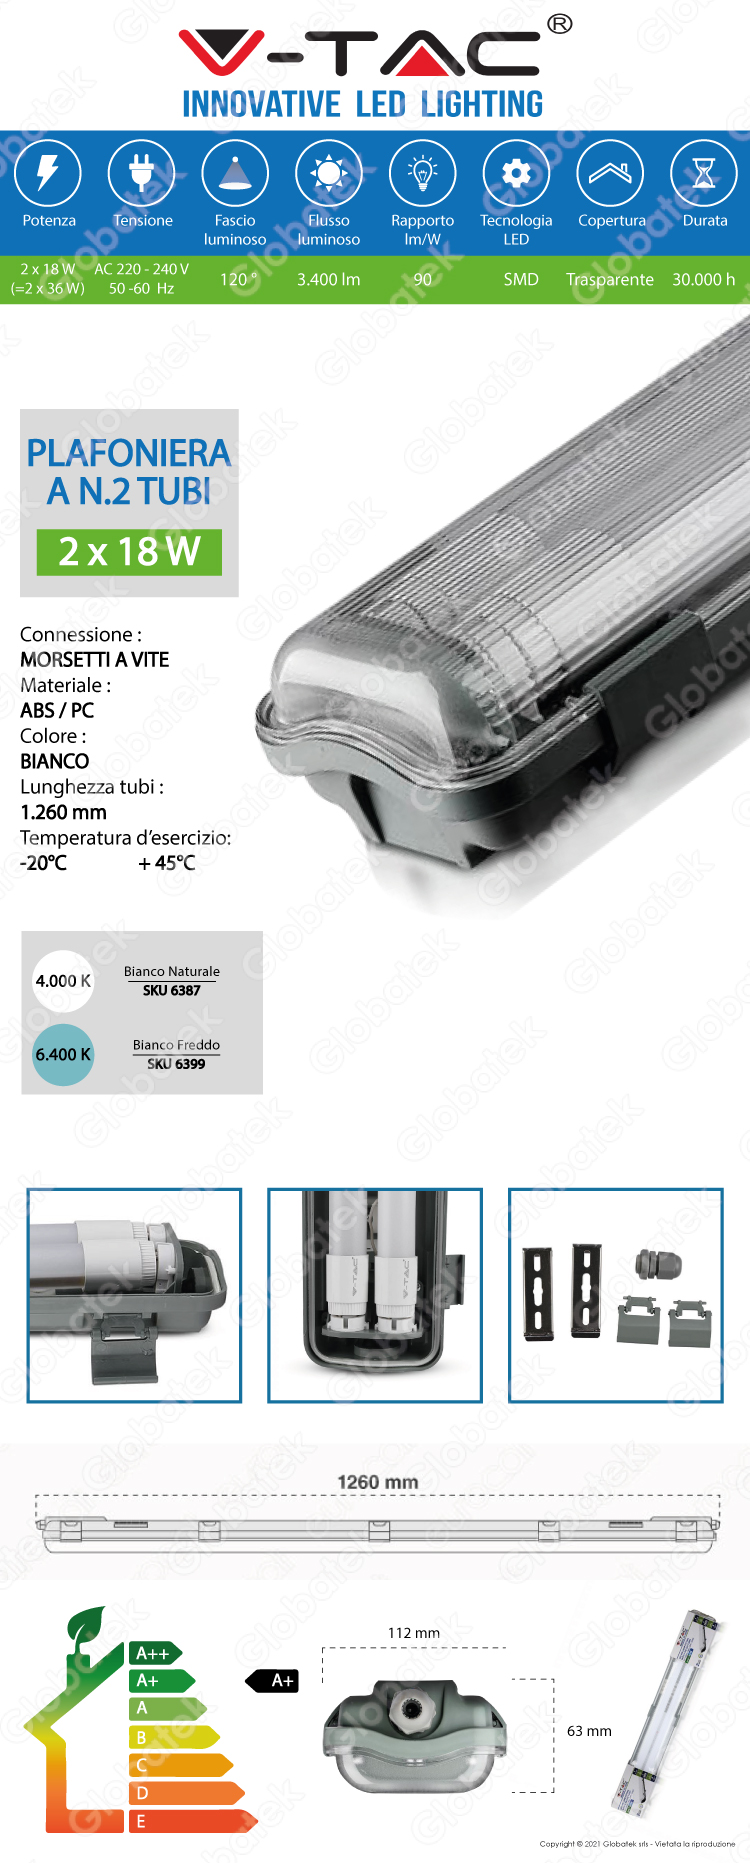 V-TAC VT-12023 TUBO LED PLAFONIERA 2X18W LAMPADINA 120CM IMPERMEABILE